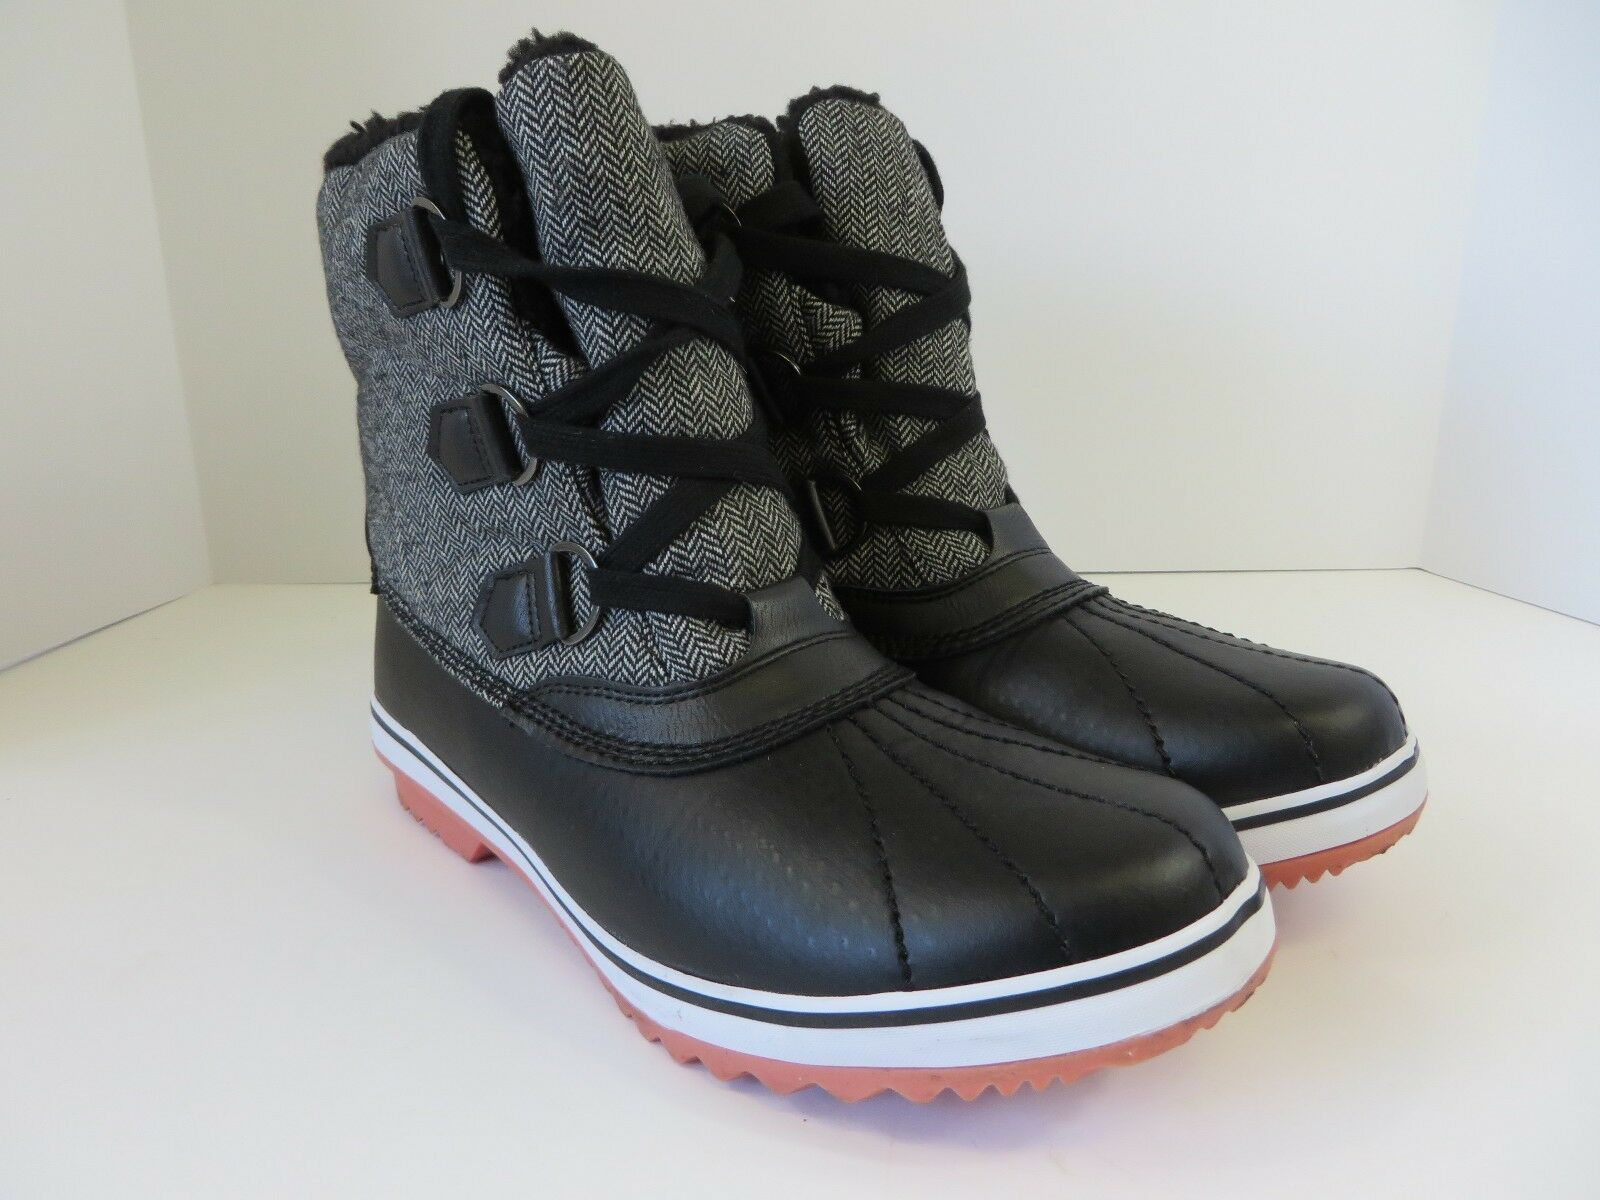 JBU by Jambu Womens Brenda Boot All Terrain Rugged Fashionable Black 9M #B486